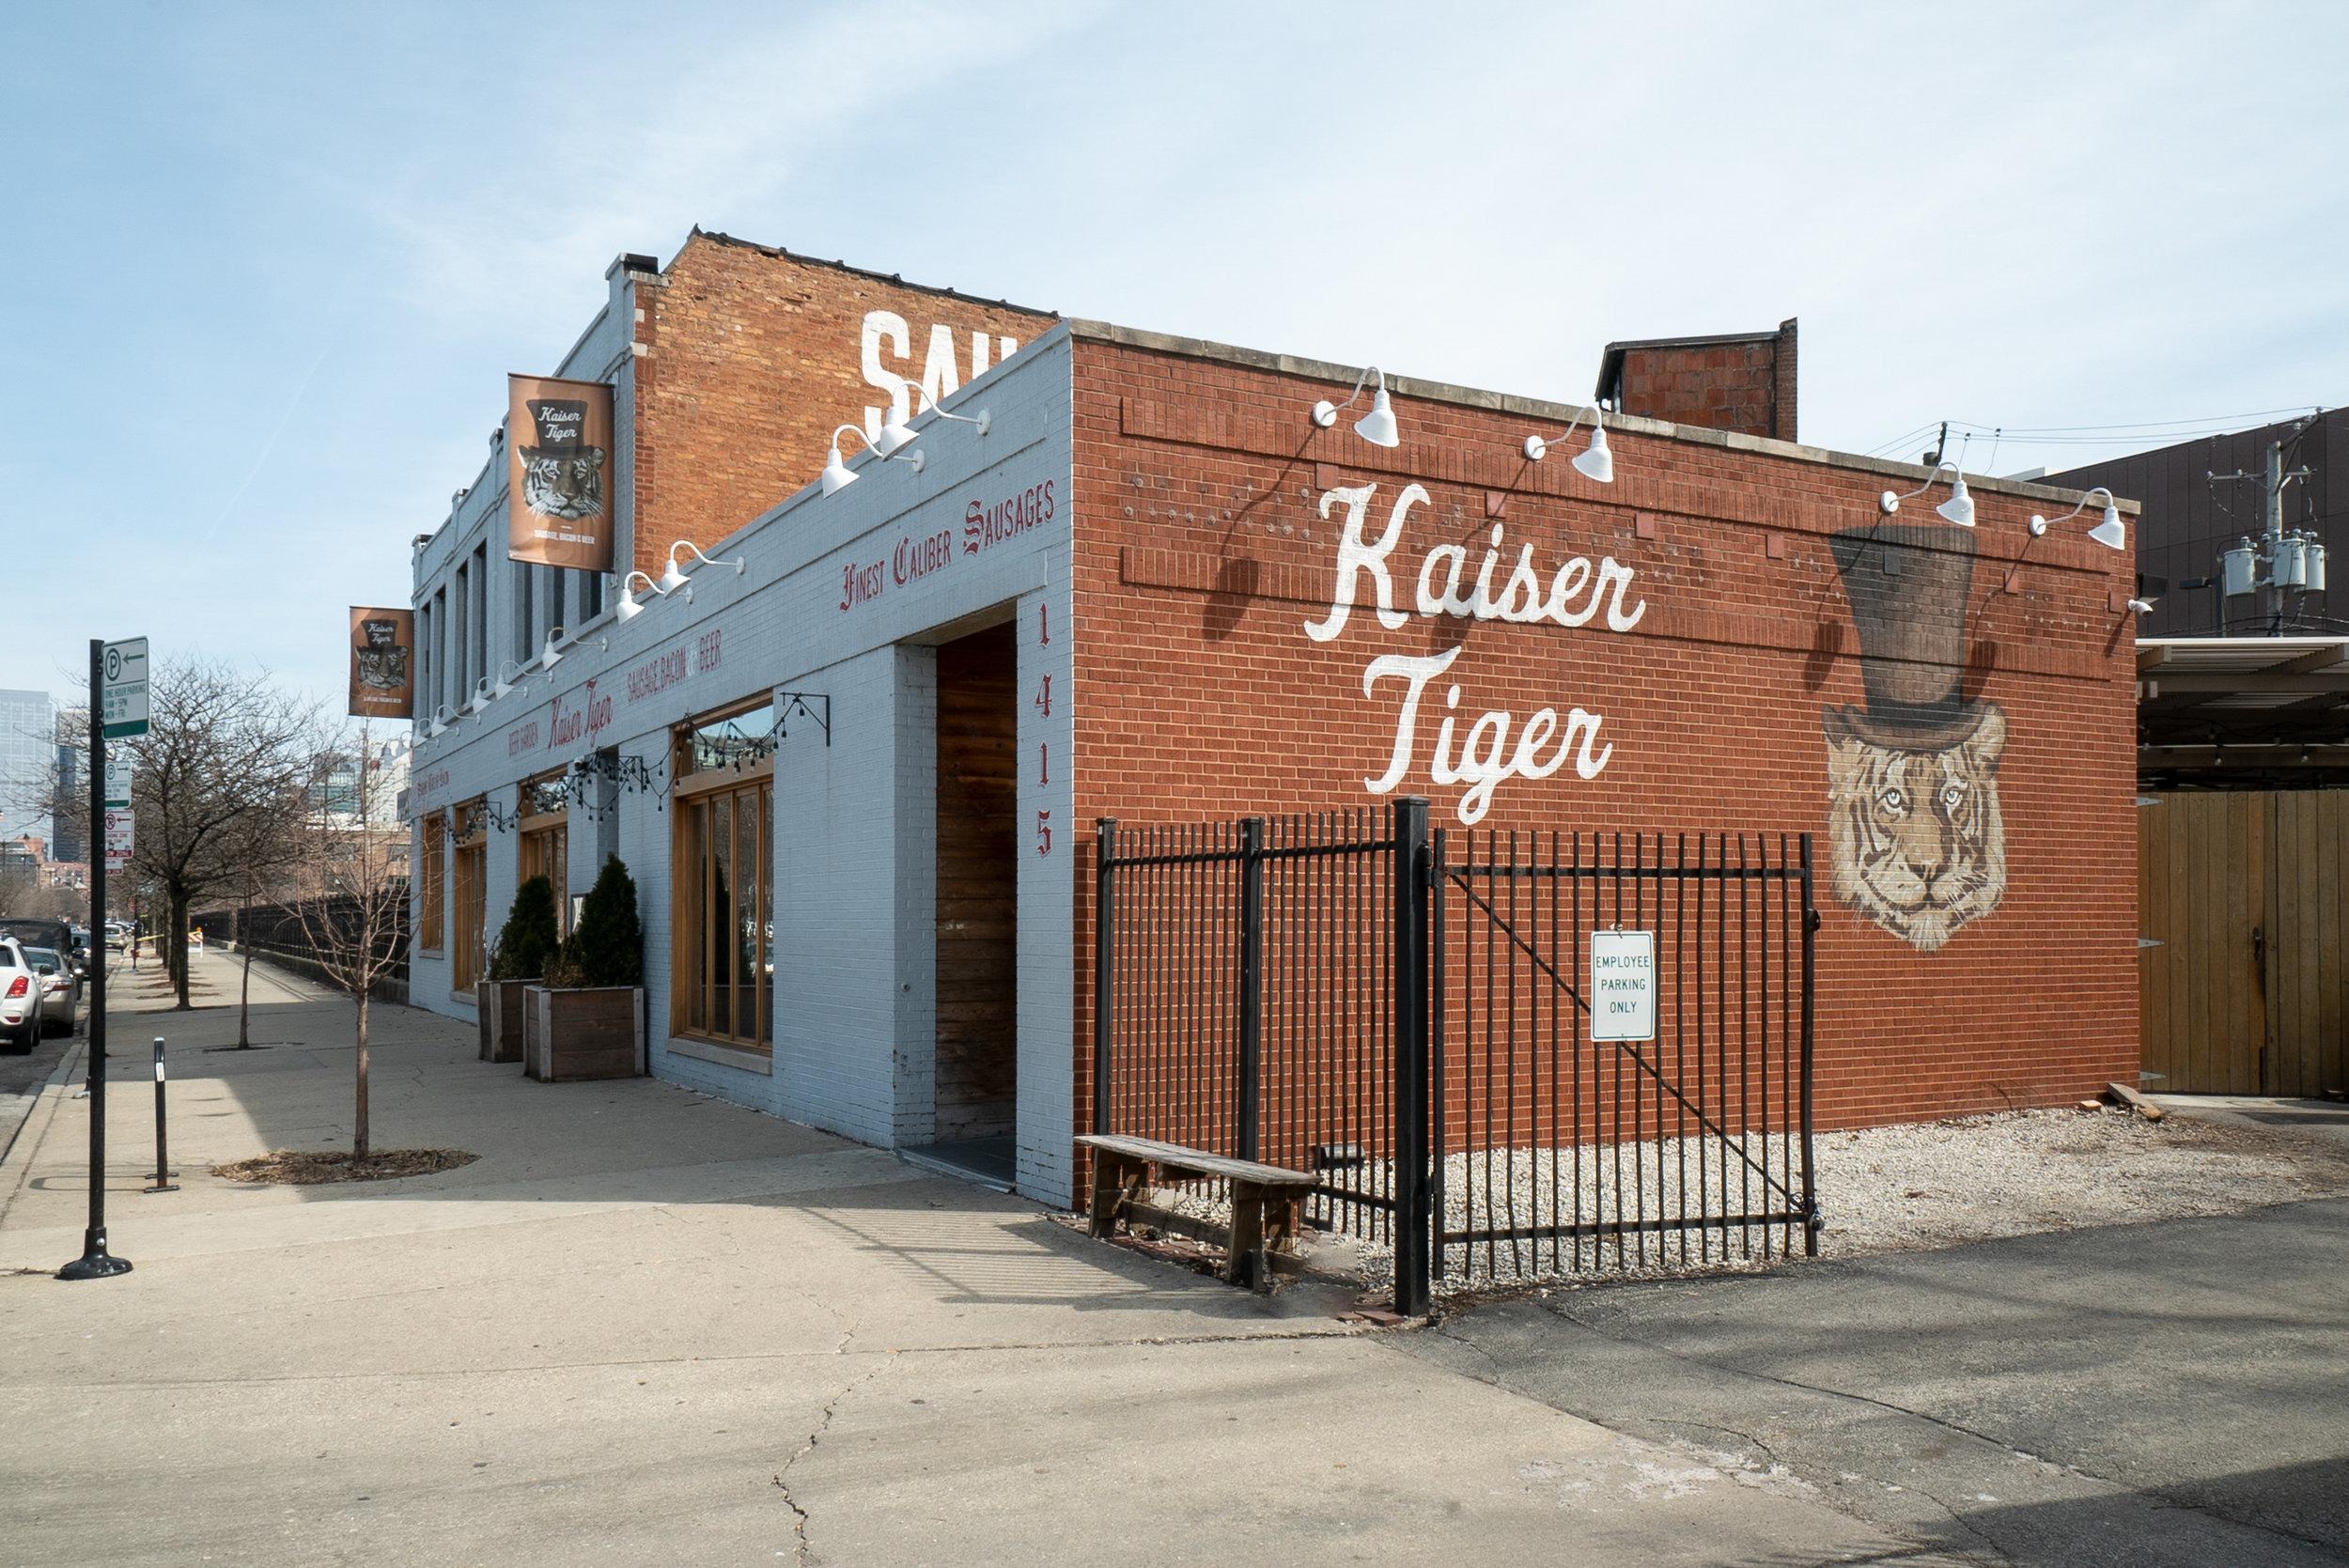 Kaiser Tiger